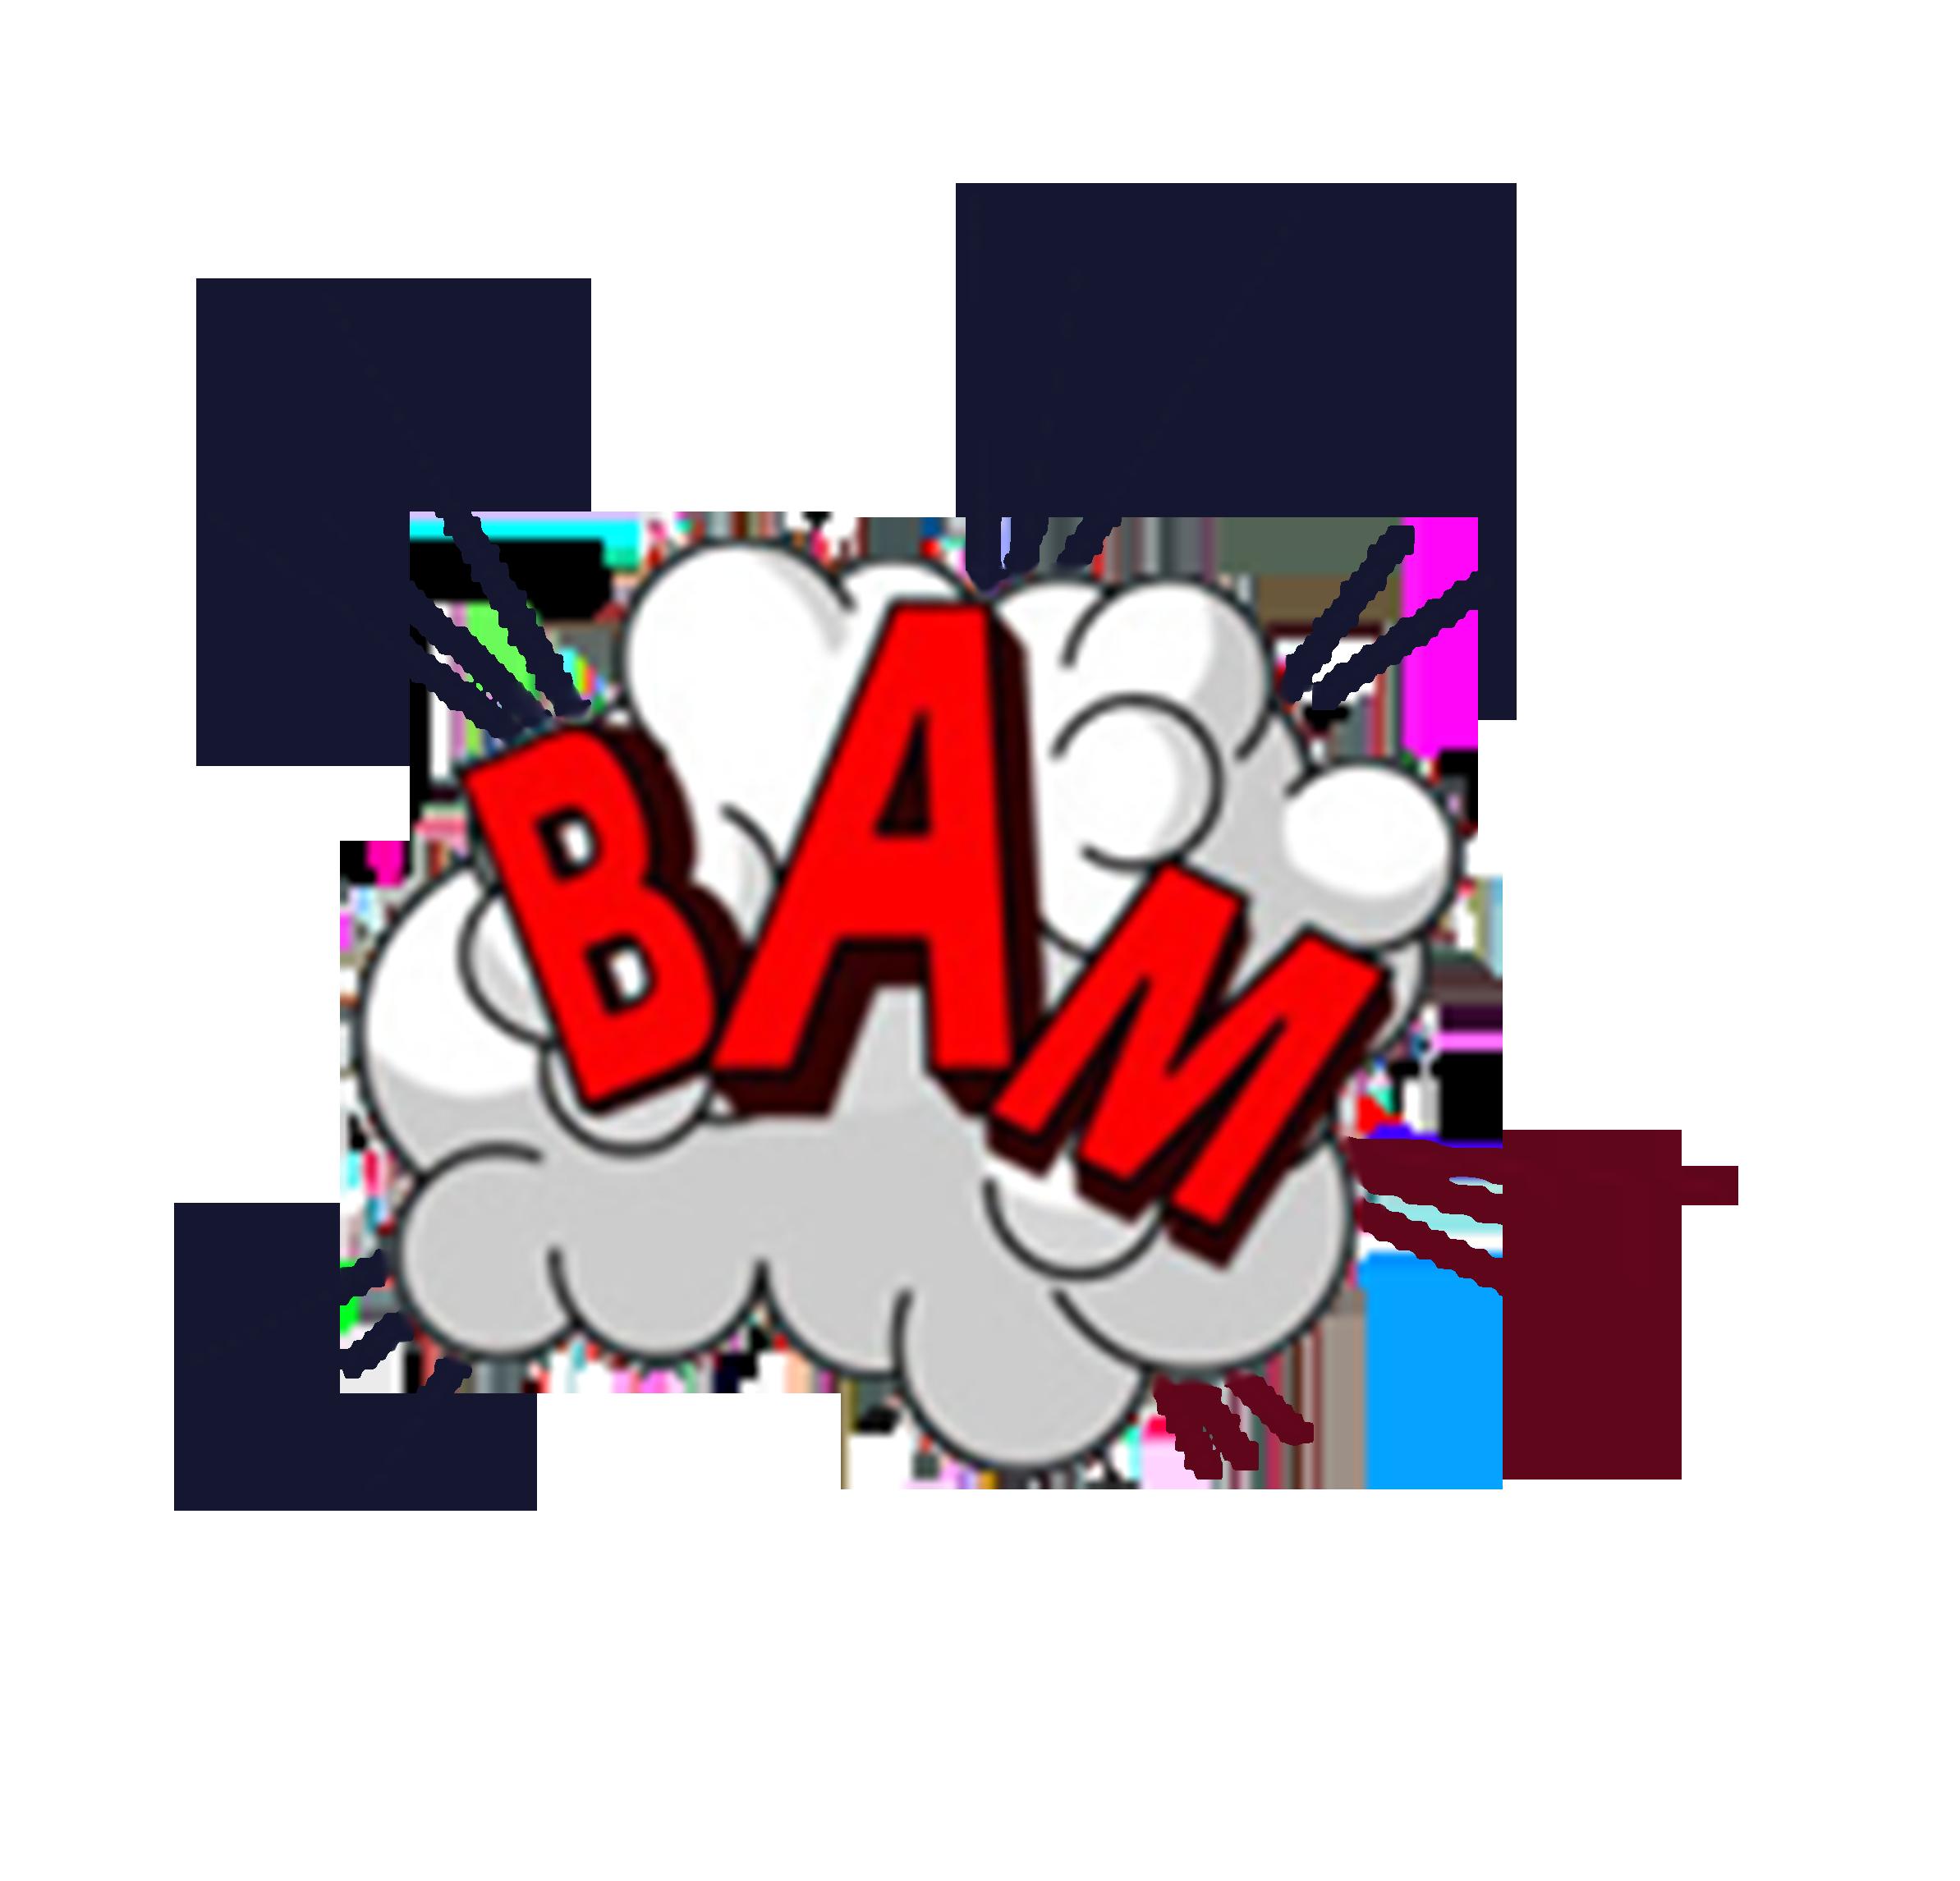 Explosion clipart bam. Explosive effect transprent png